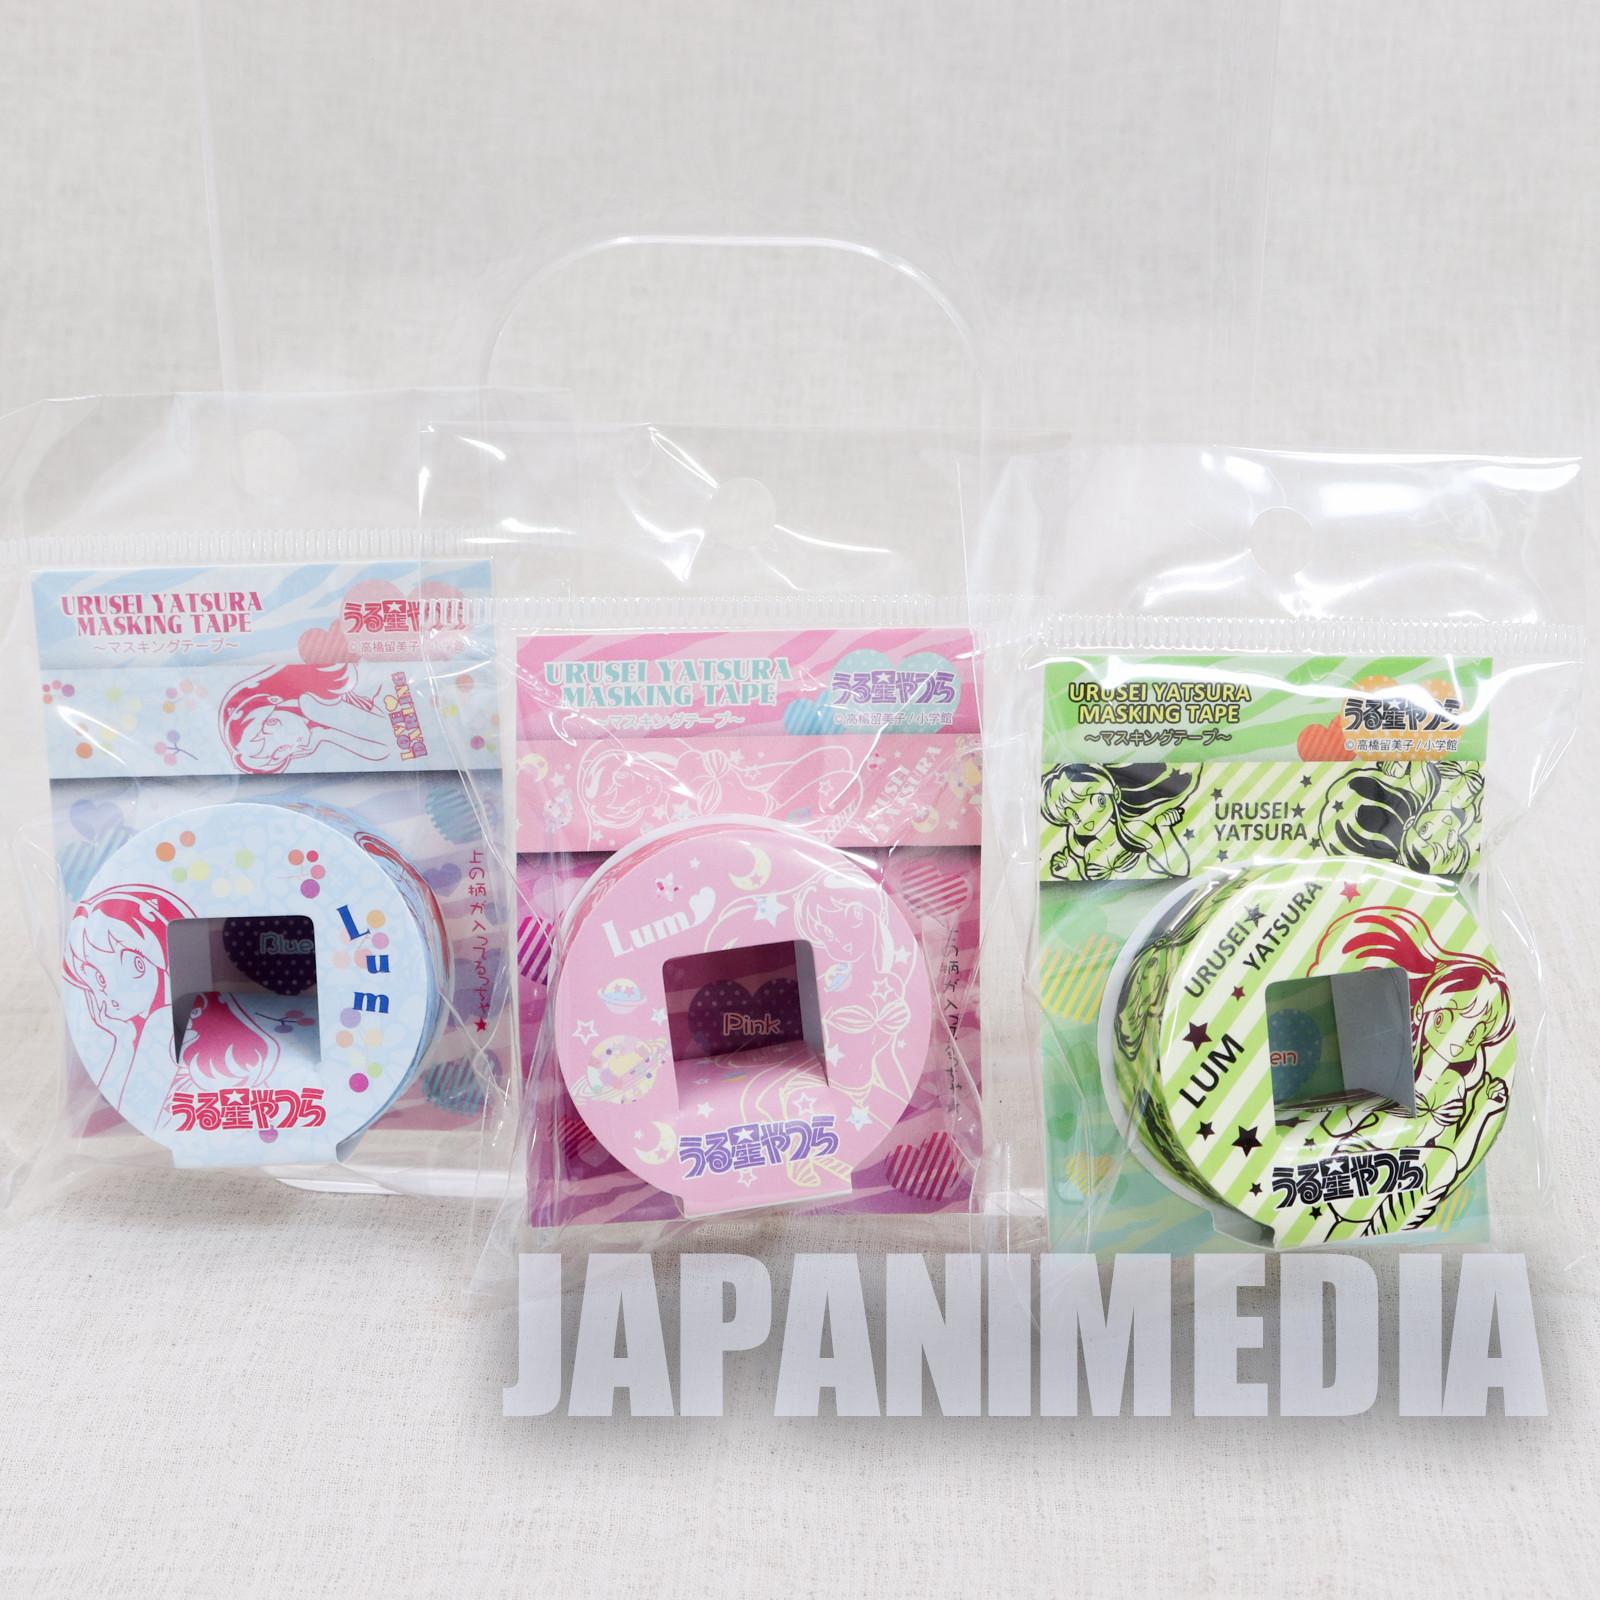 Urusei Yatsura Masking Tape 3ps Set JAPAN ANIME 2